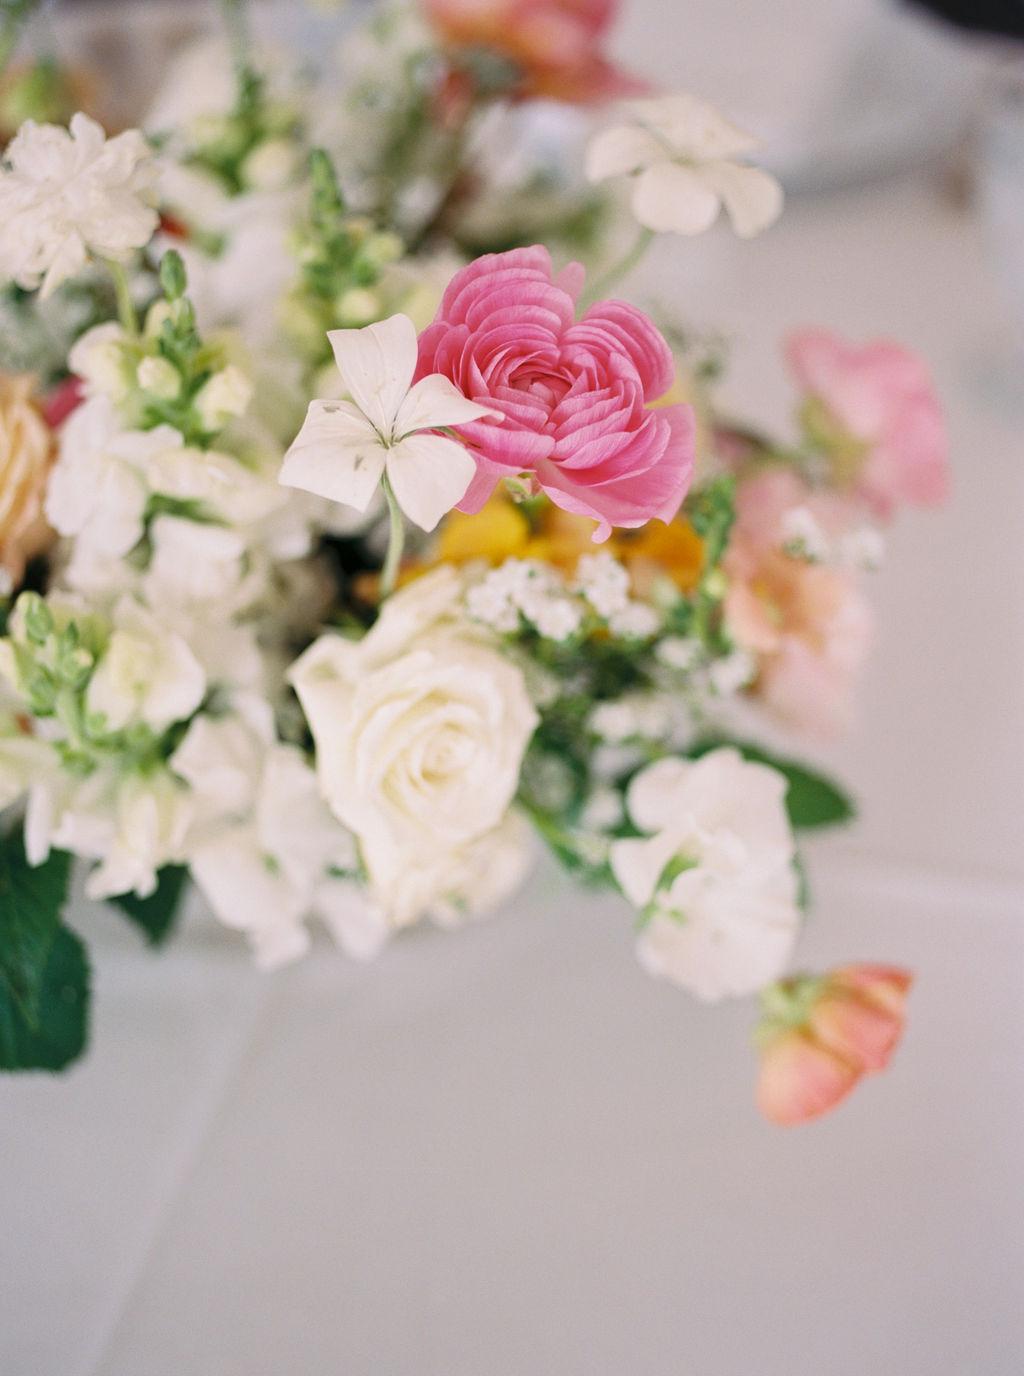 Alexandra-Elise-Photography-Film-Wedding-Photographer-Sonnenberg-Gardens-Finger-Lakes-Canandaigua-Reception-011.jpg